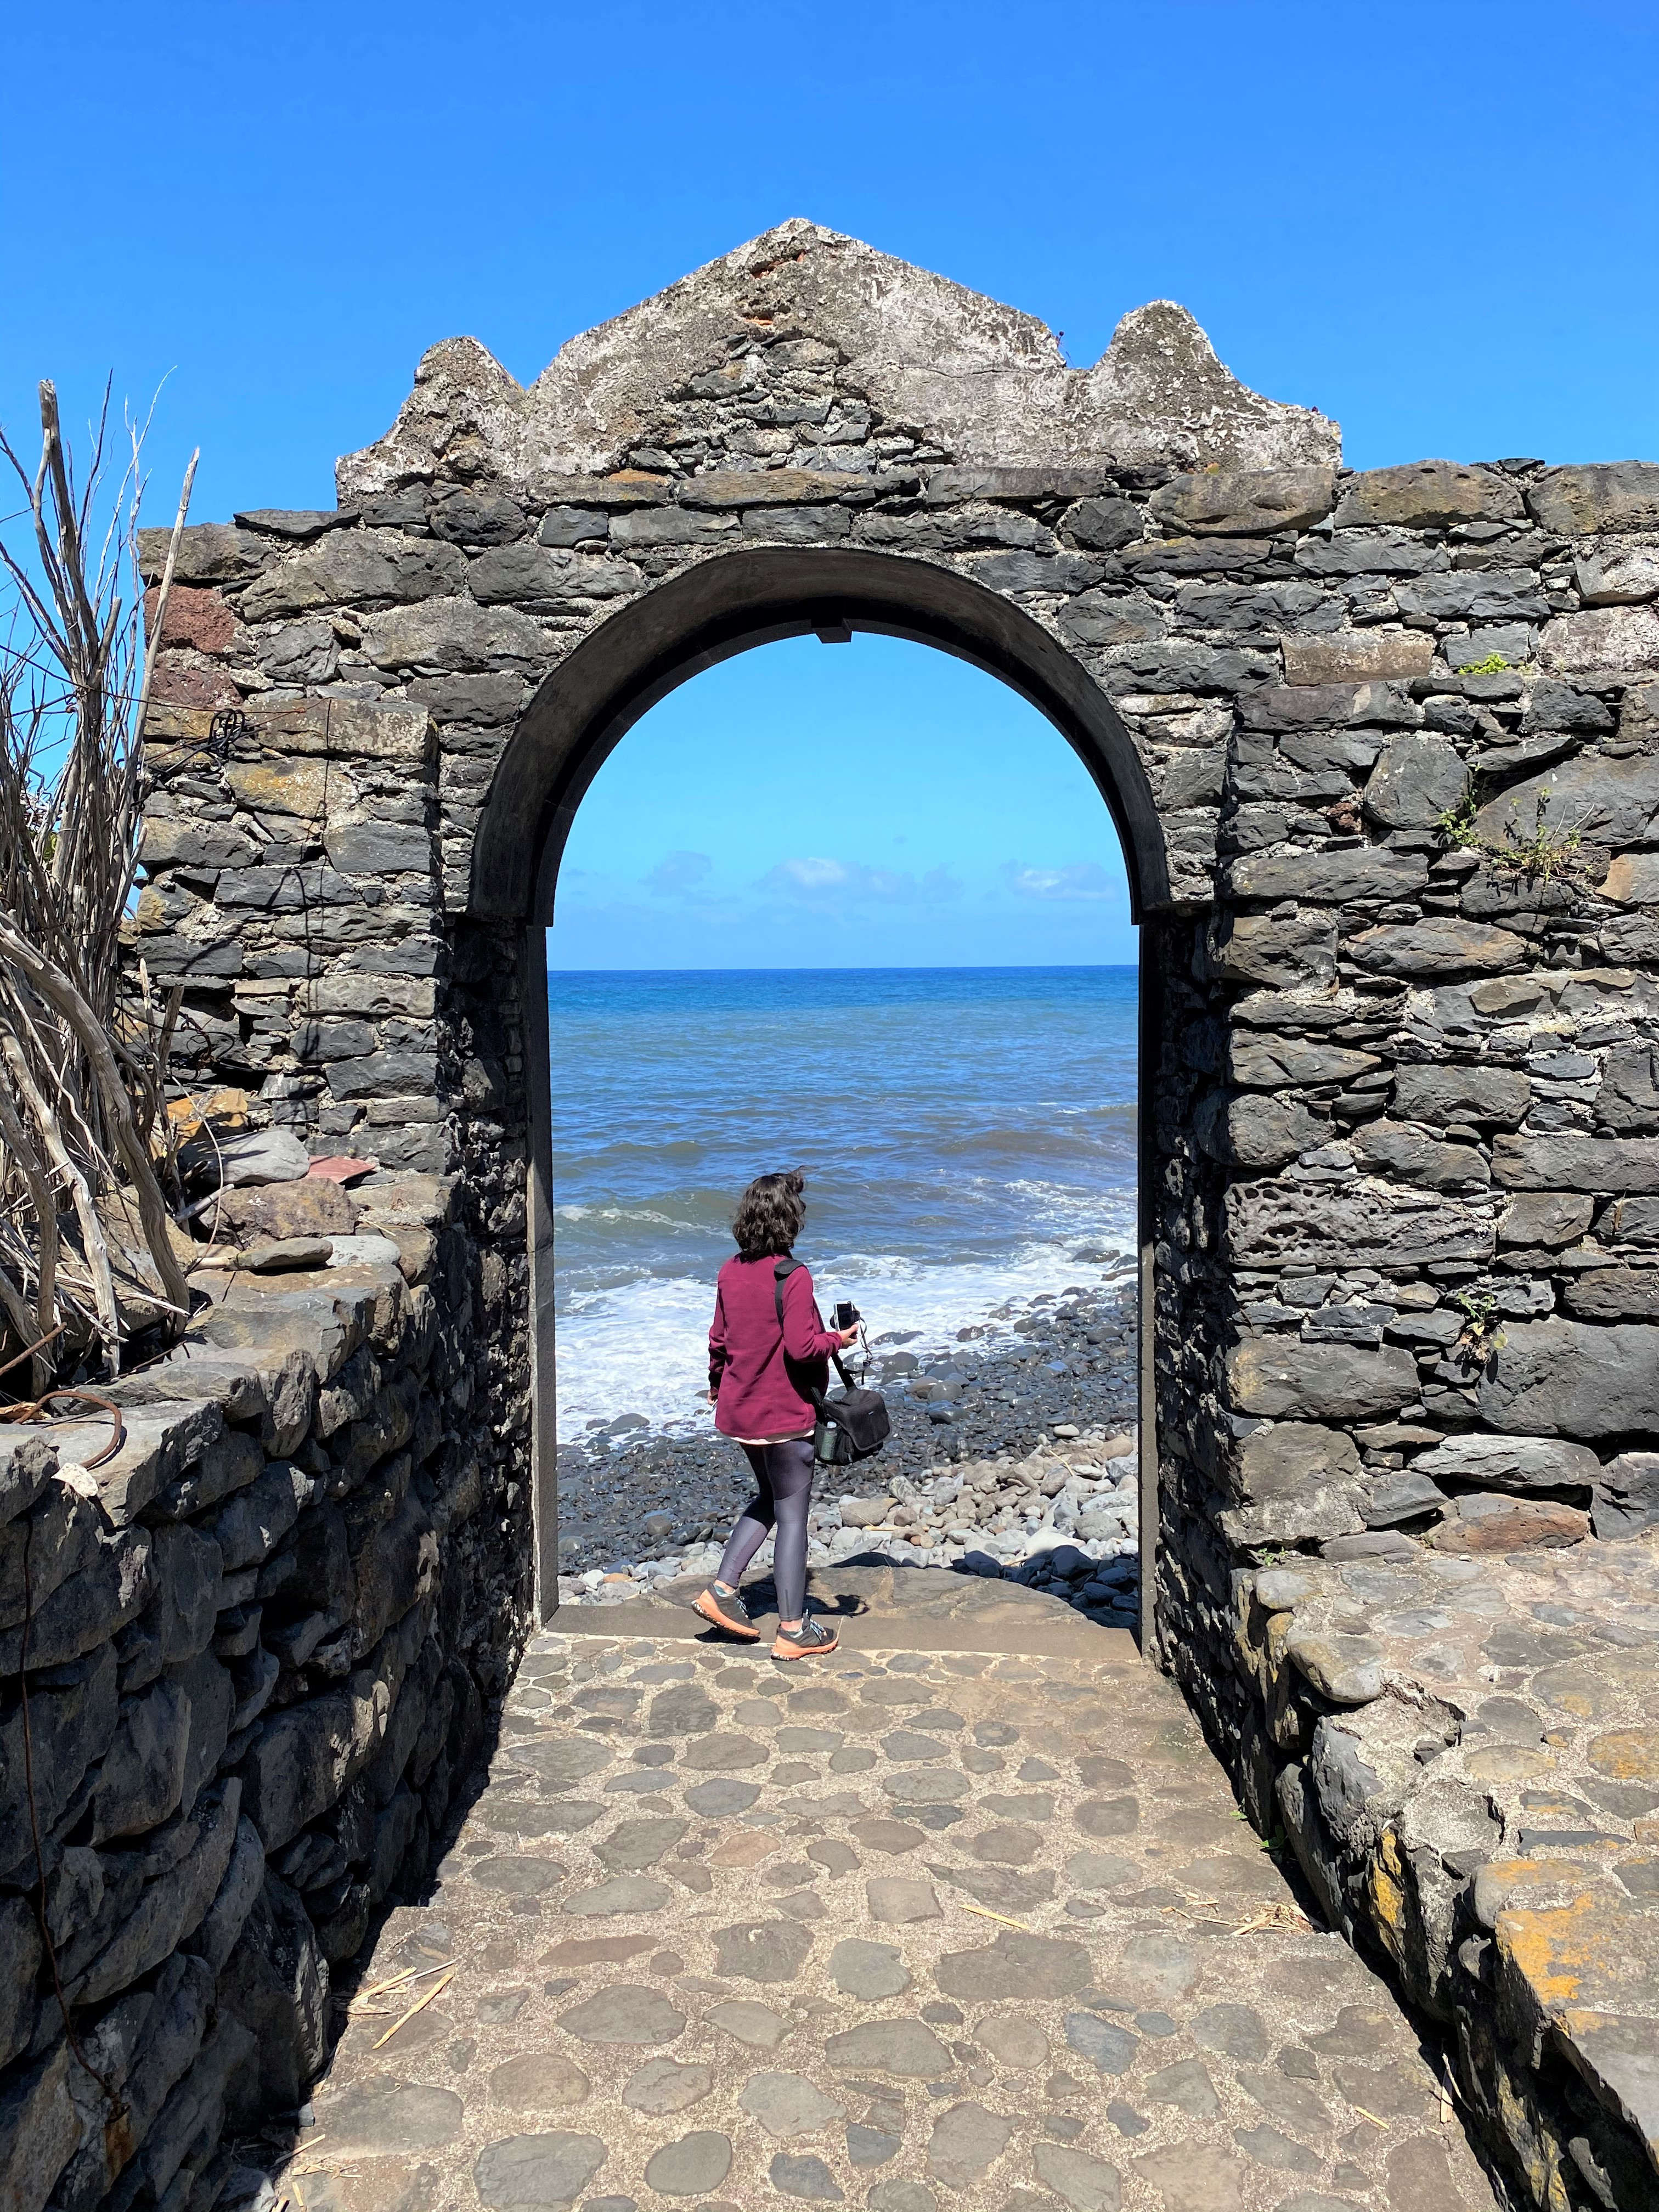 Ruines de saint george - Sao Jorge - Madère - porto da cruz